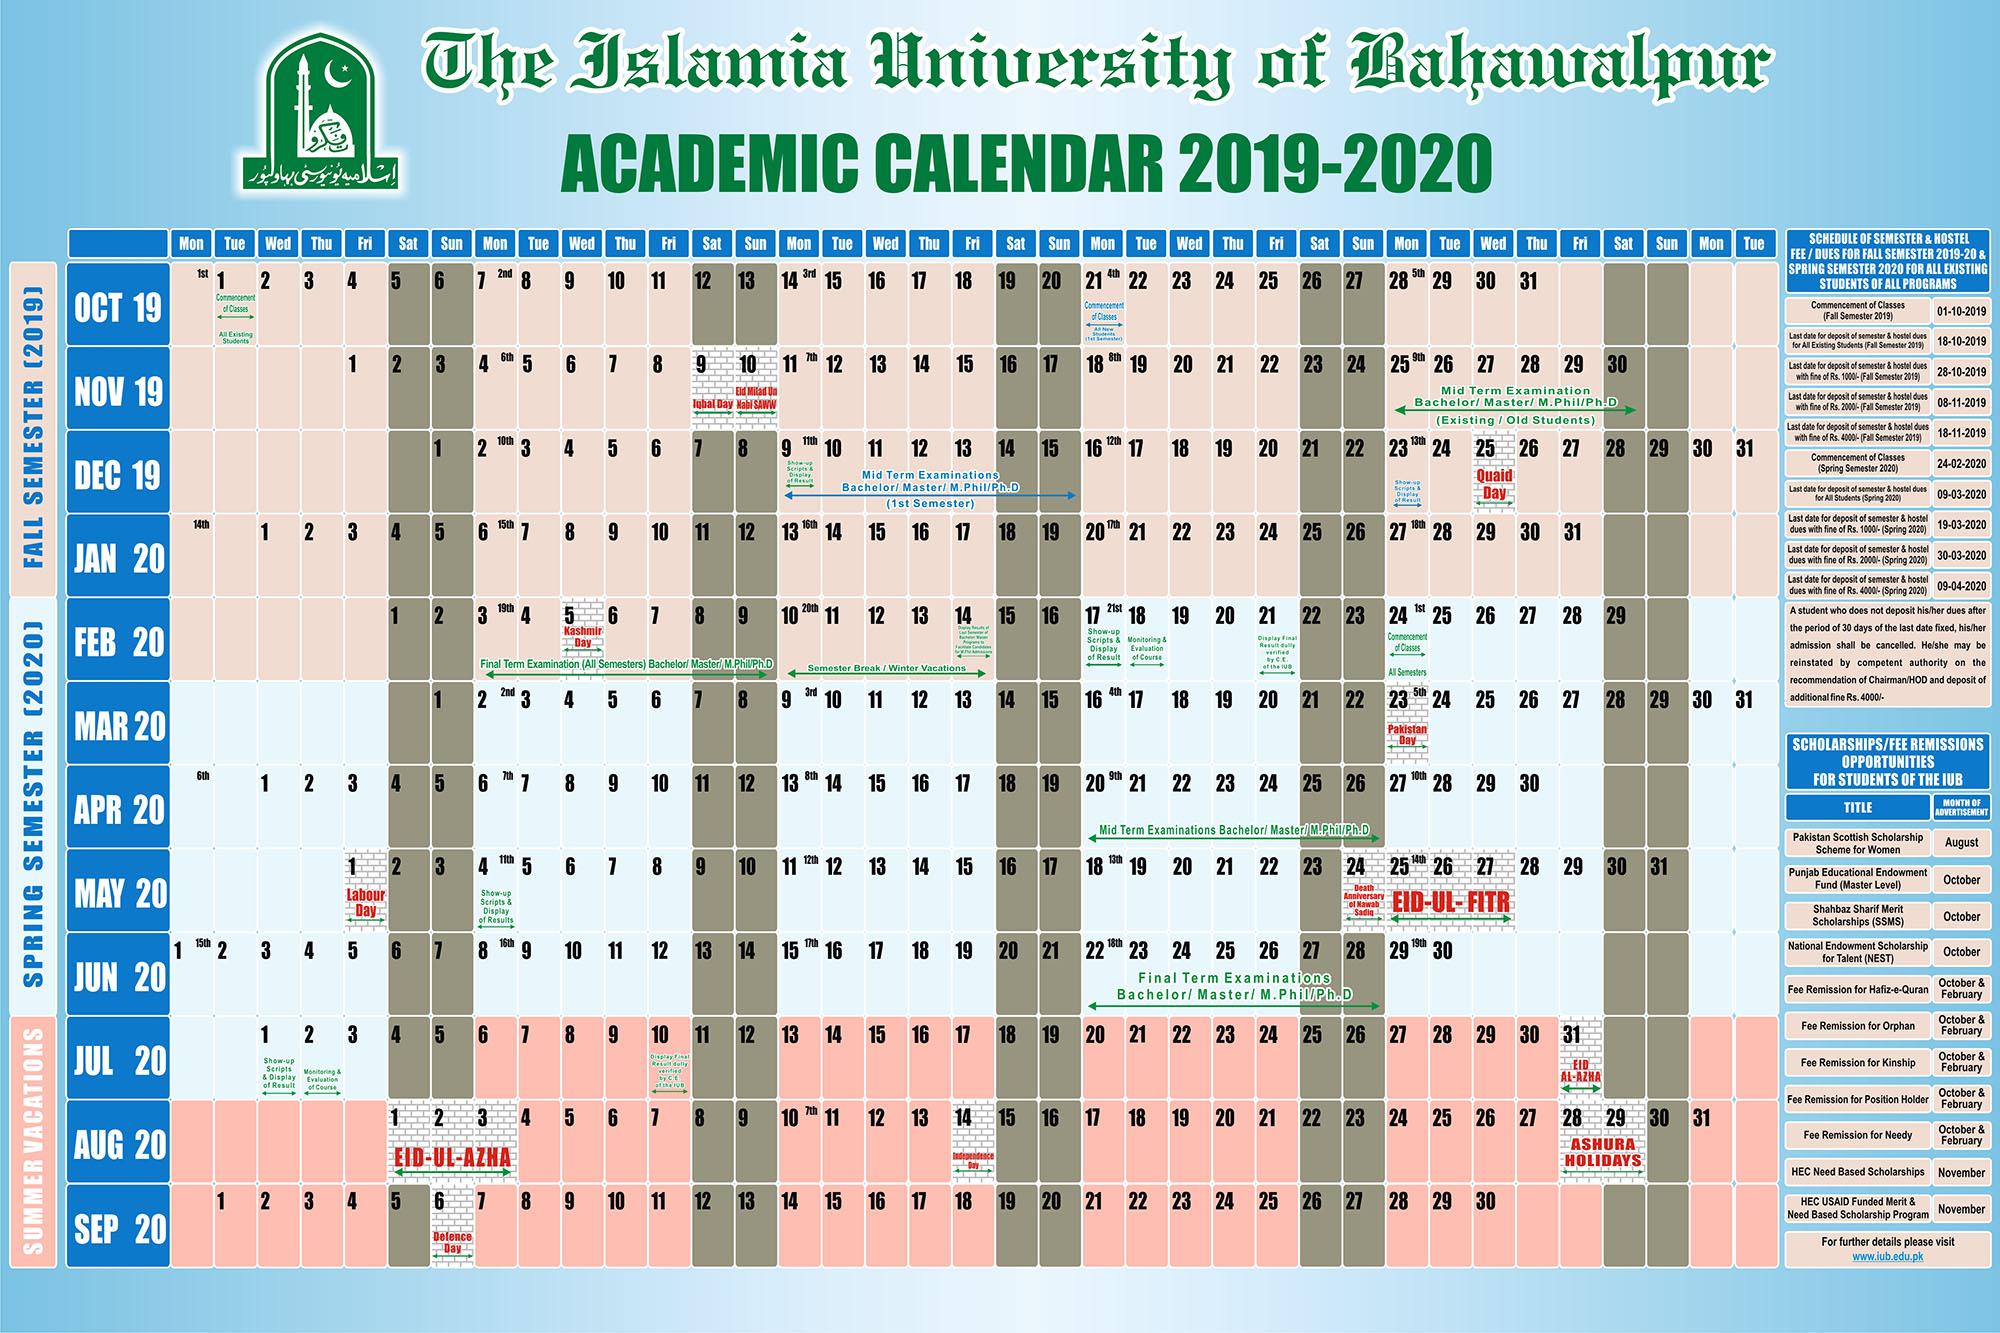 Iu Academic Calendar Spring 2022.Academic Calendar For The Year 2019 20 Iub The Islamia University Of Bahawalpur